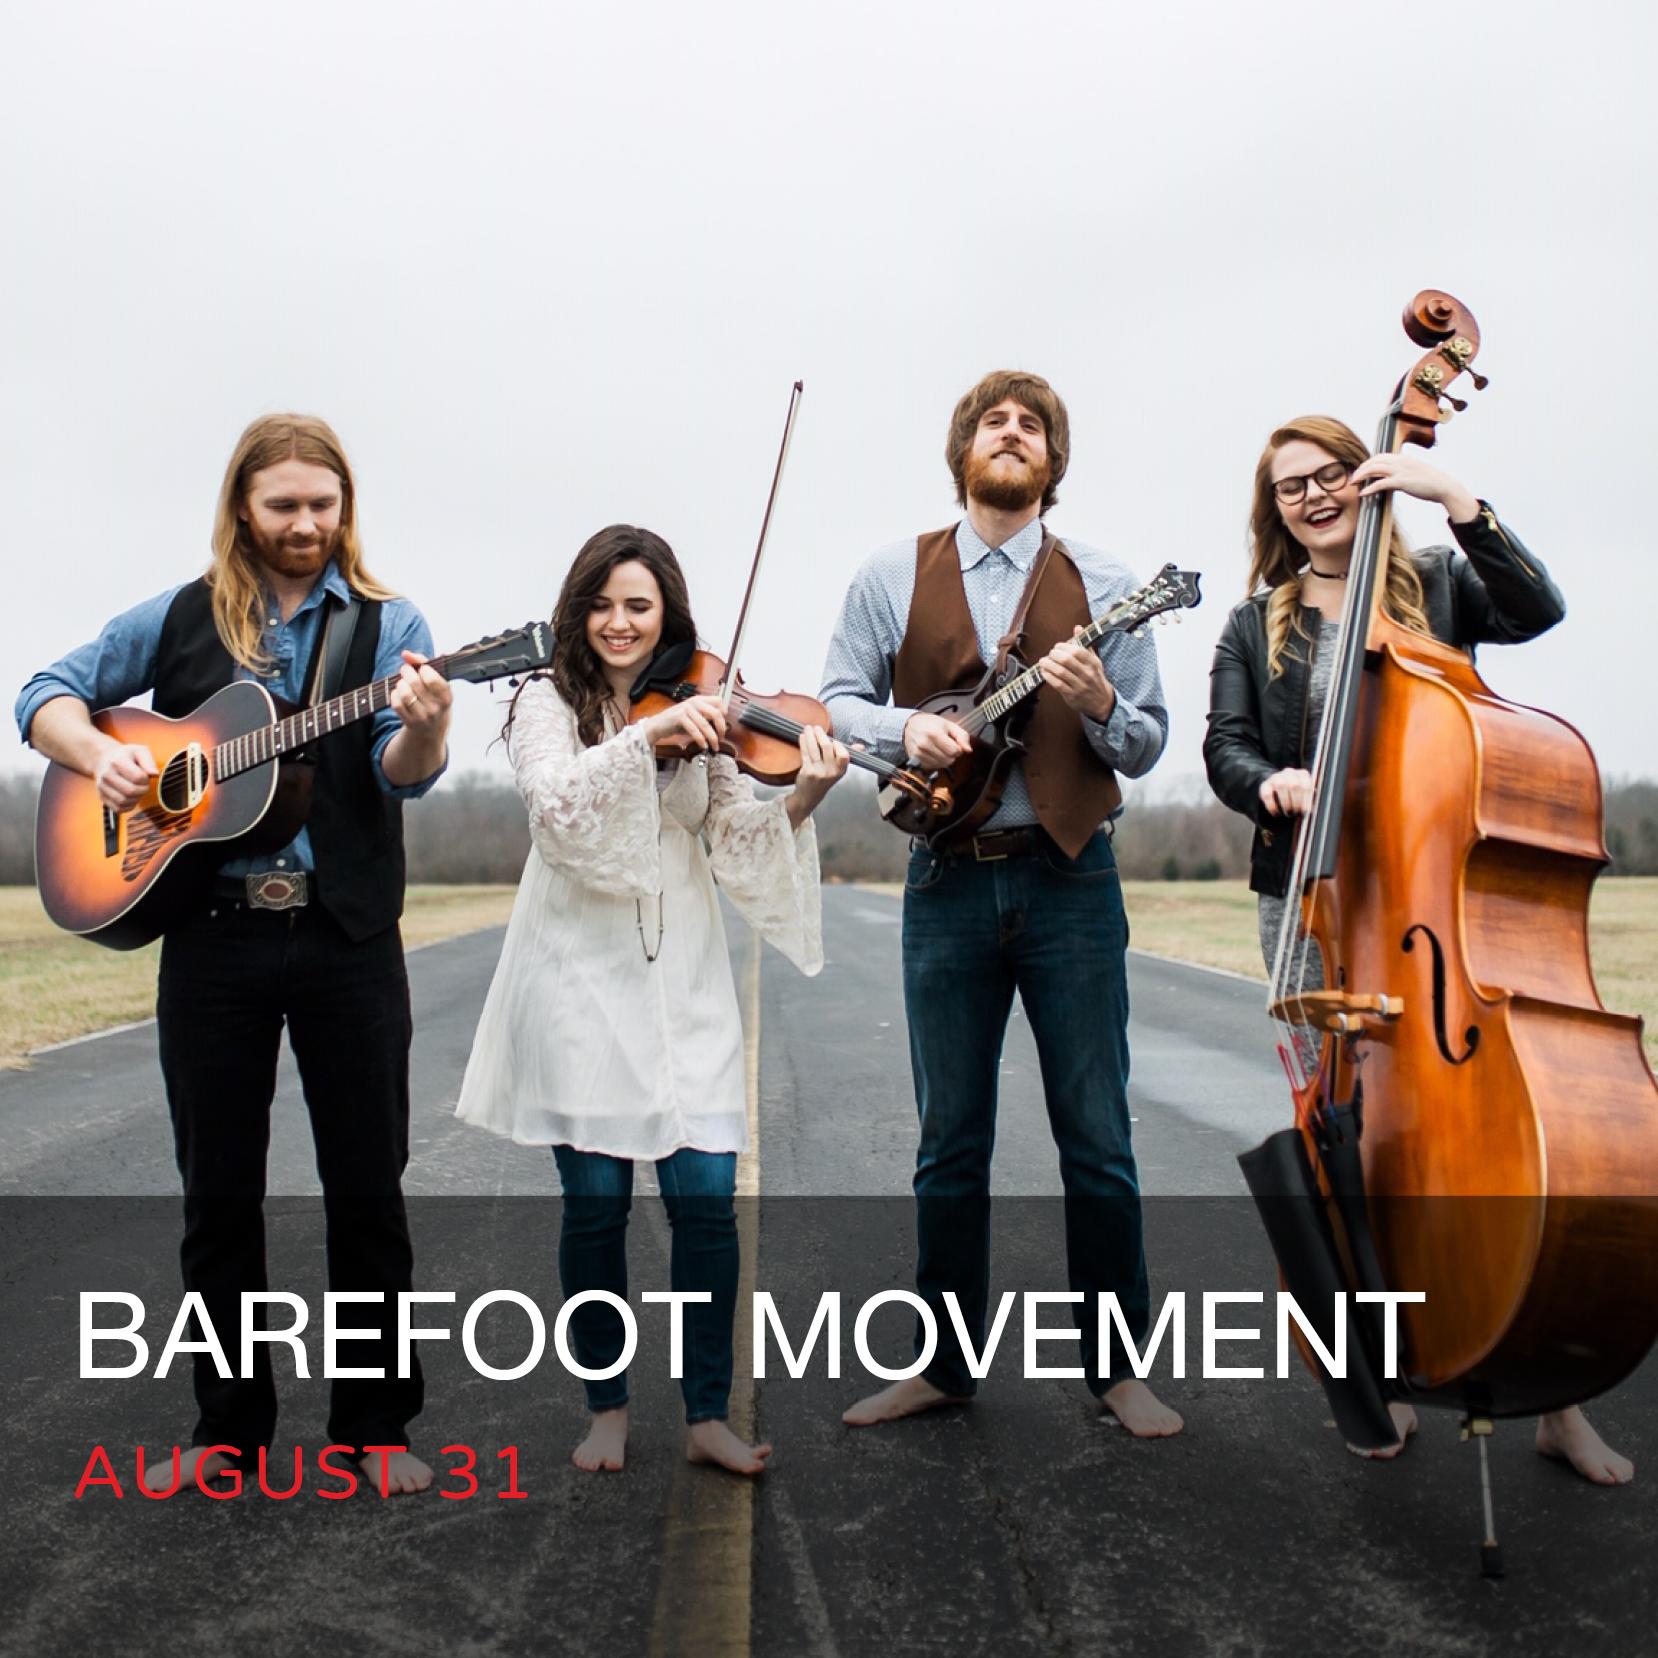 BarefootMovement_WebsiteImage.png